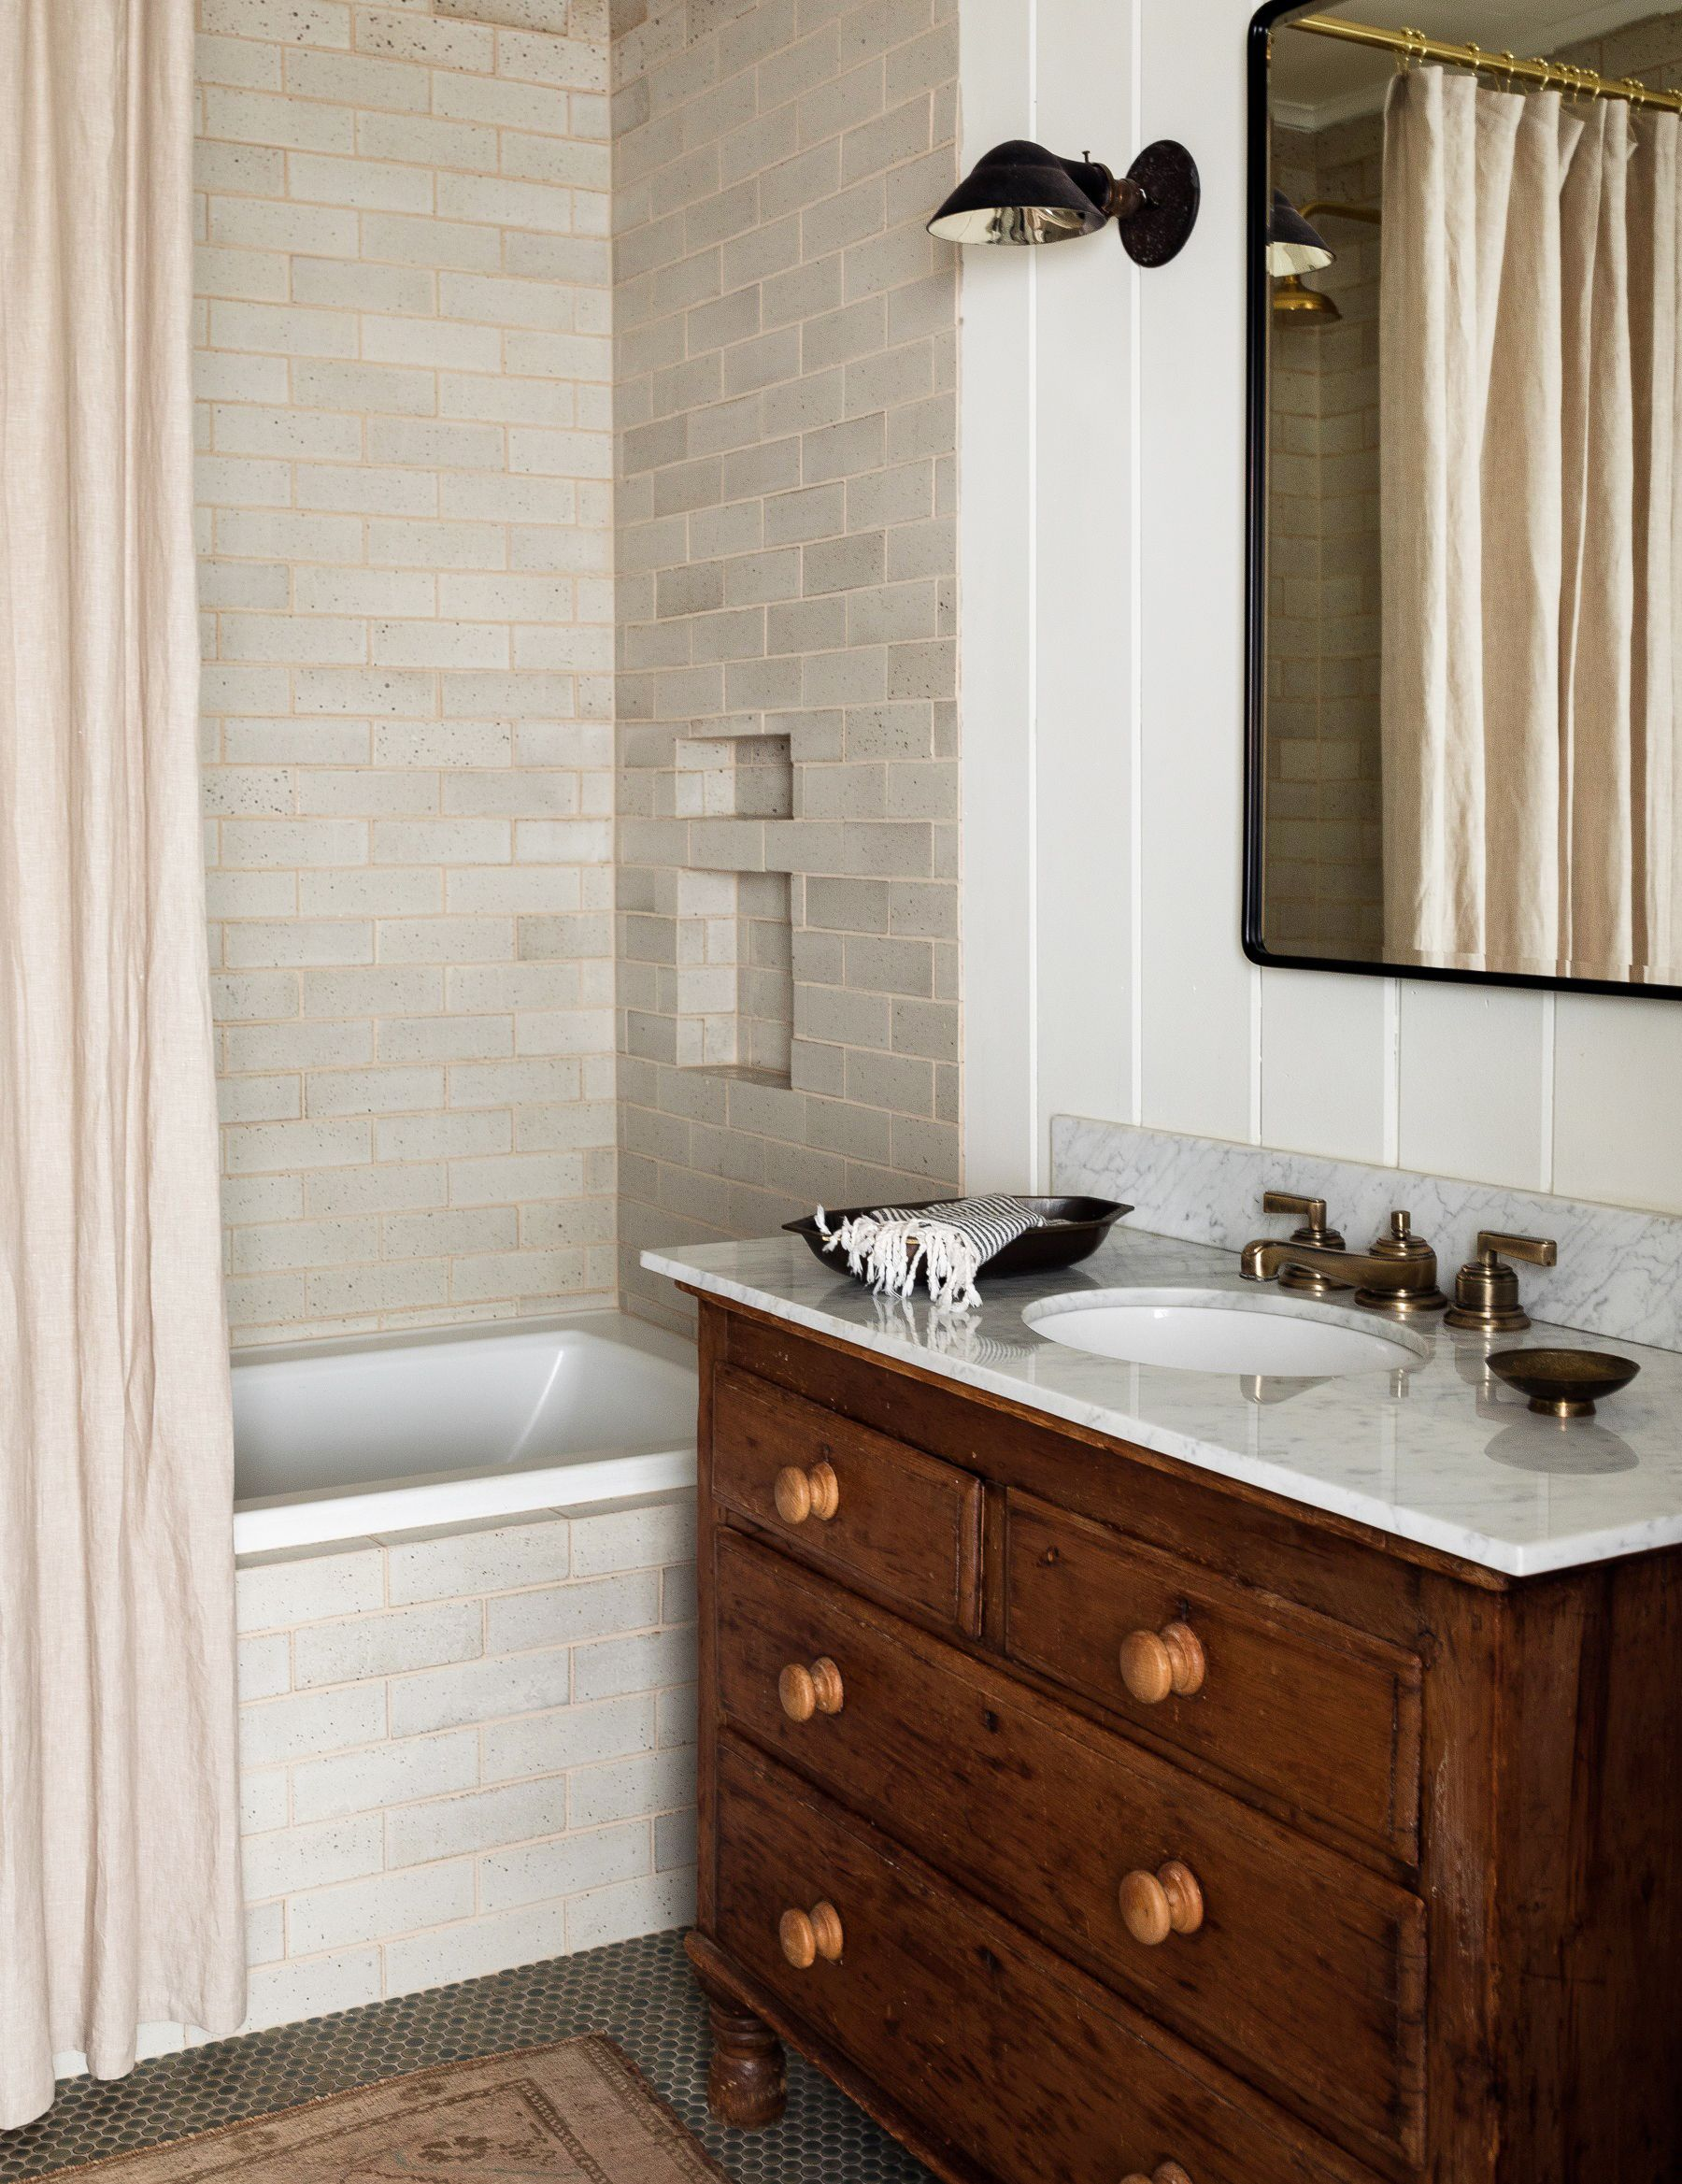 15 Best Subway Tile Bathroom Designs In 2020 Subway Tile Ideas For Bathrooms